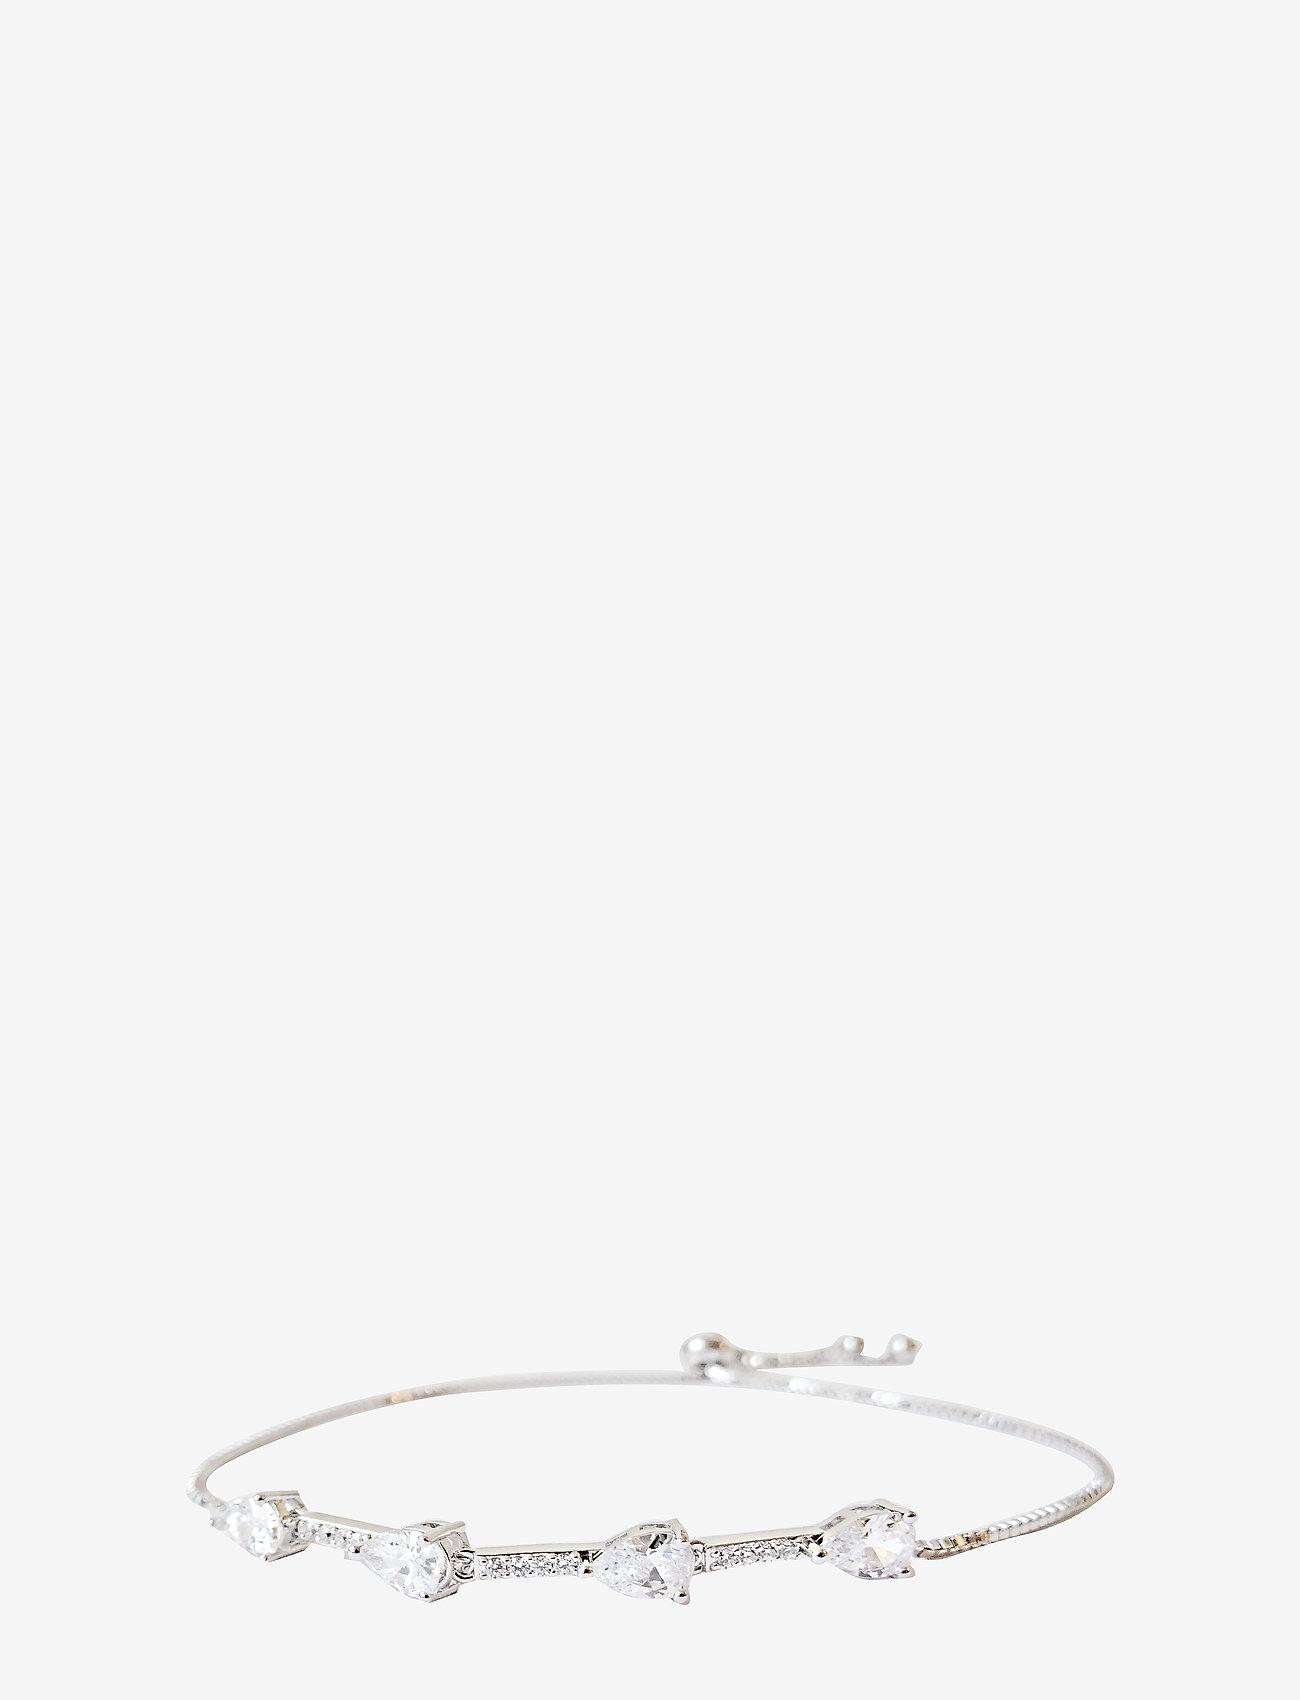 PIPOL'S BAZAAR - Kylie String PIPOL Bracelet Silvery Clear - dainty - silver